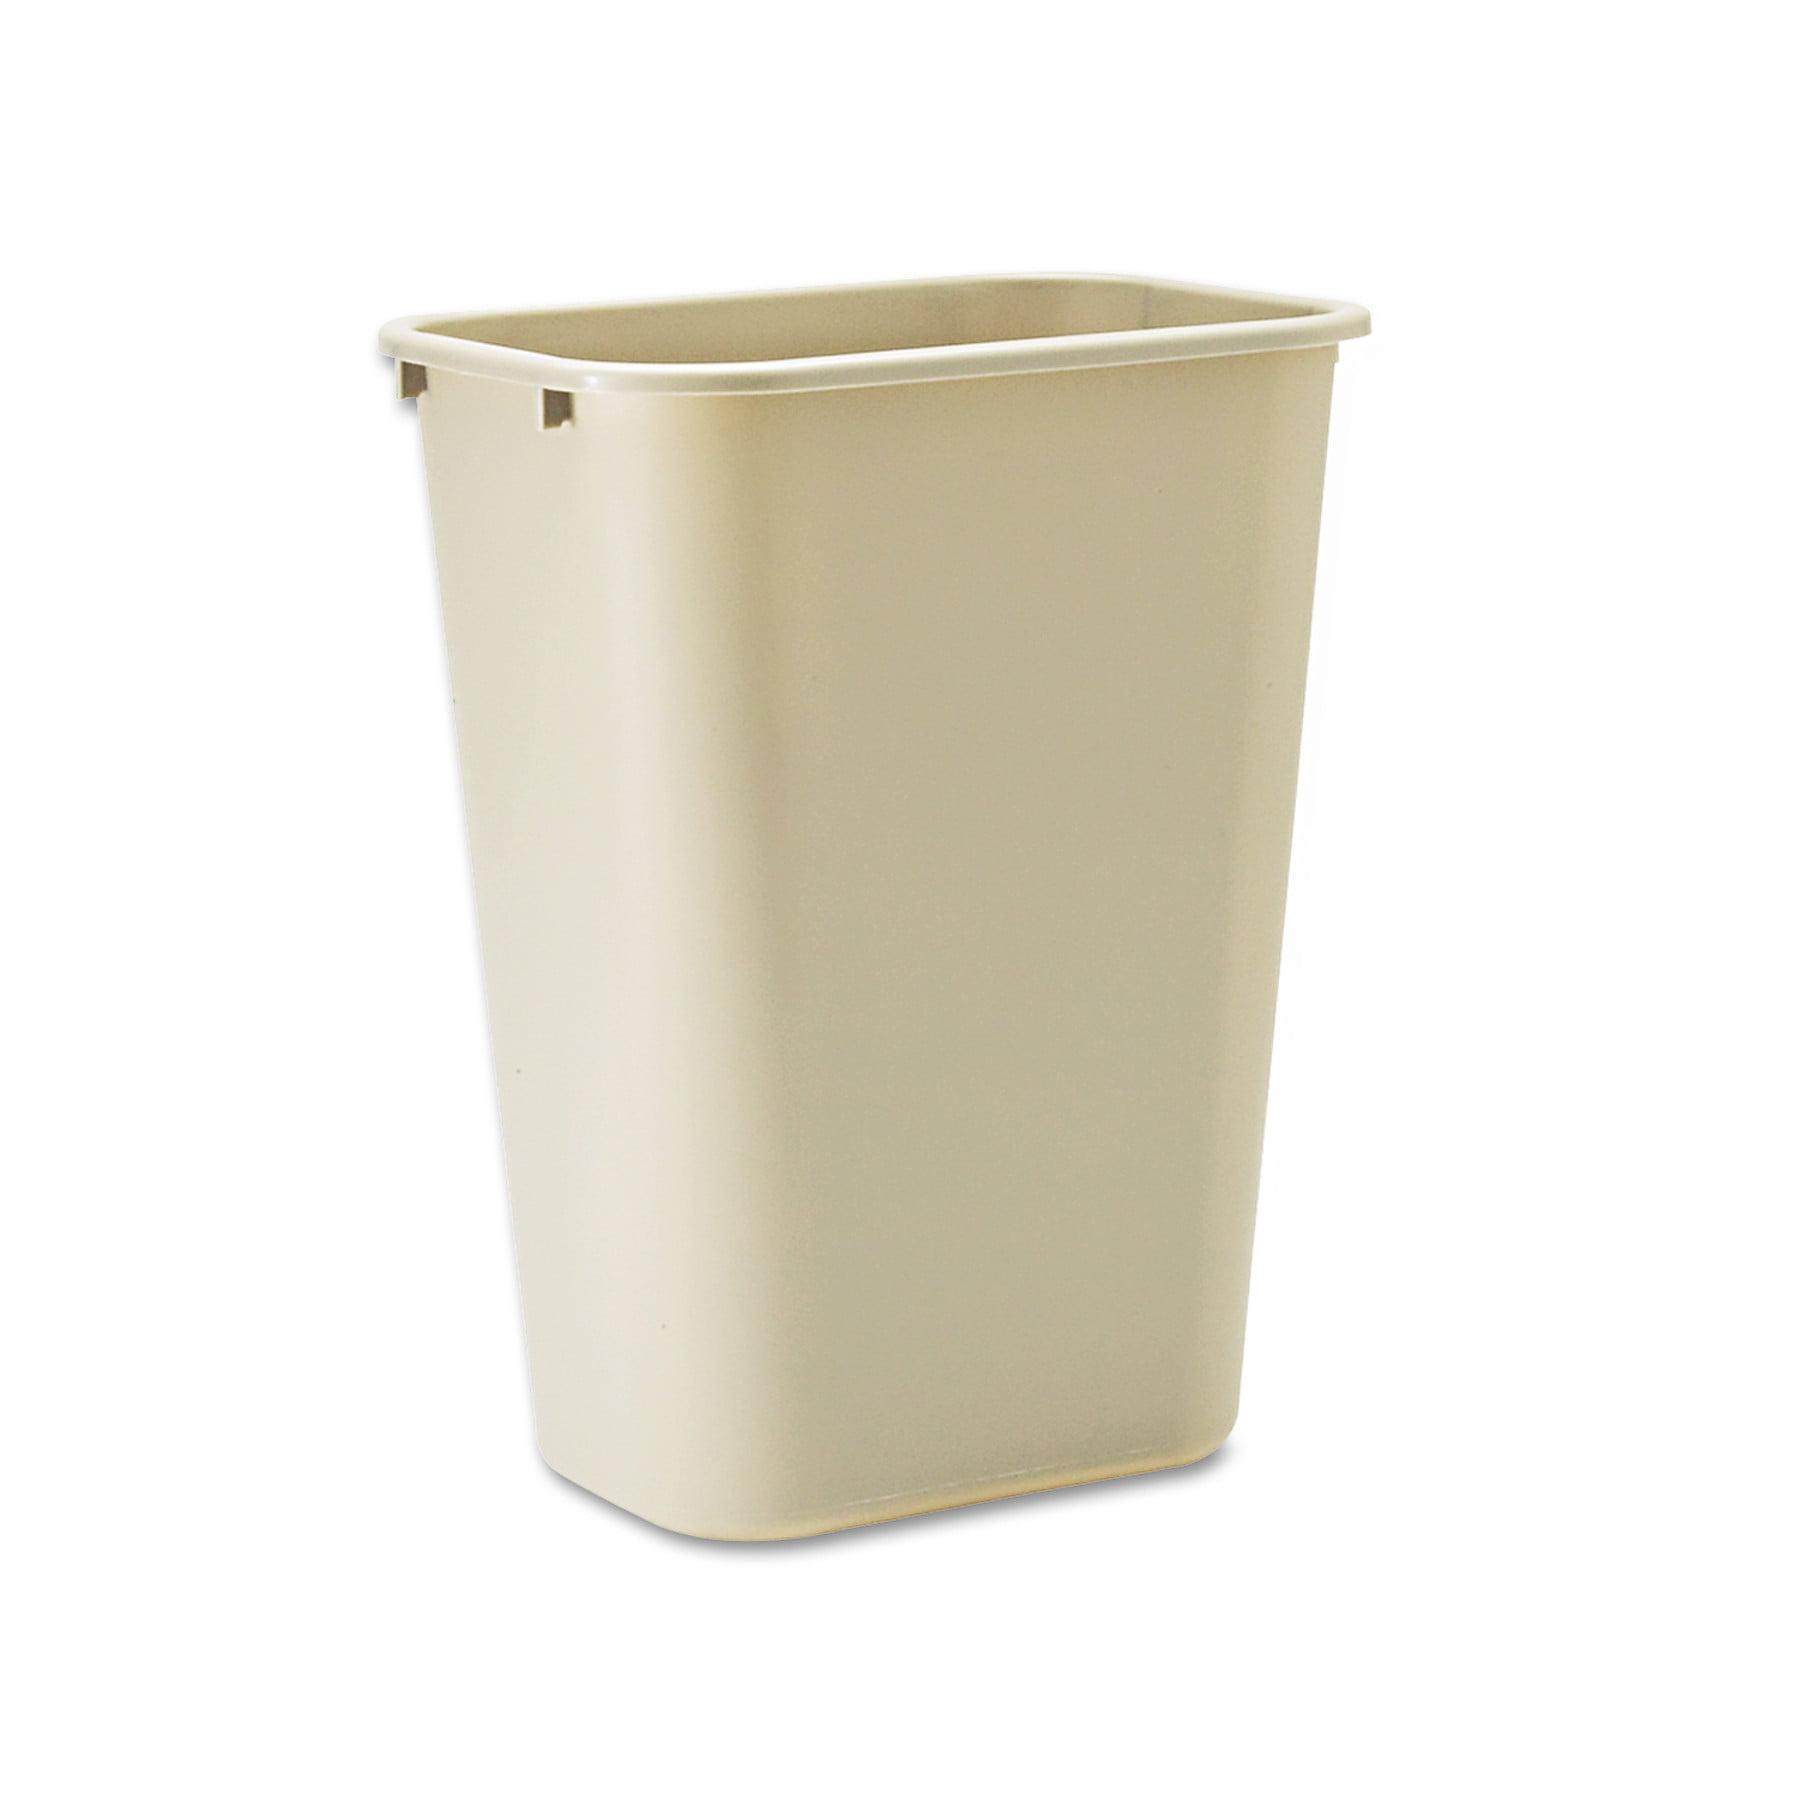 rubbermaid commercial deskside plastic wastebasket rectangular 10 14 gal beige